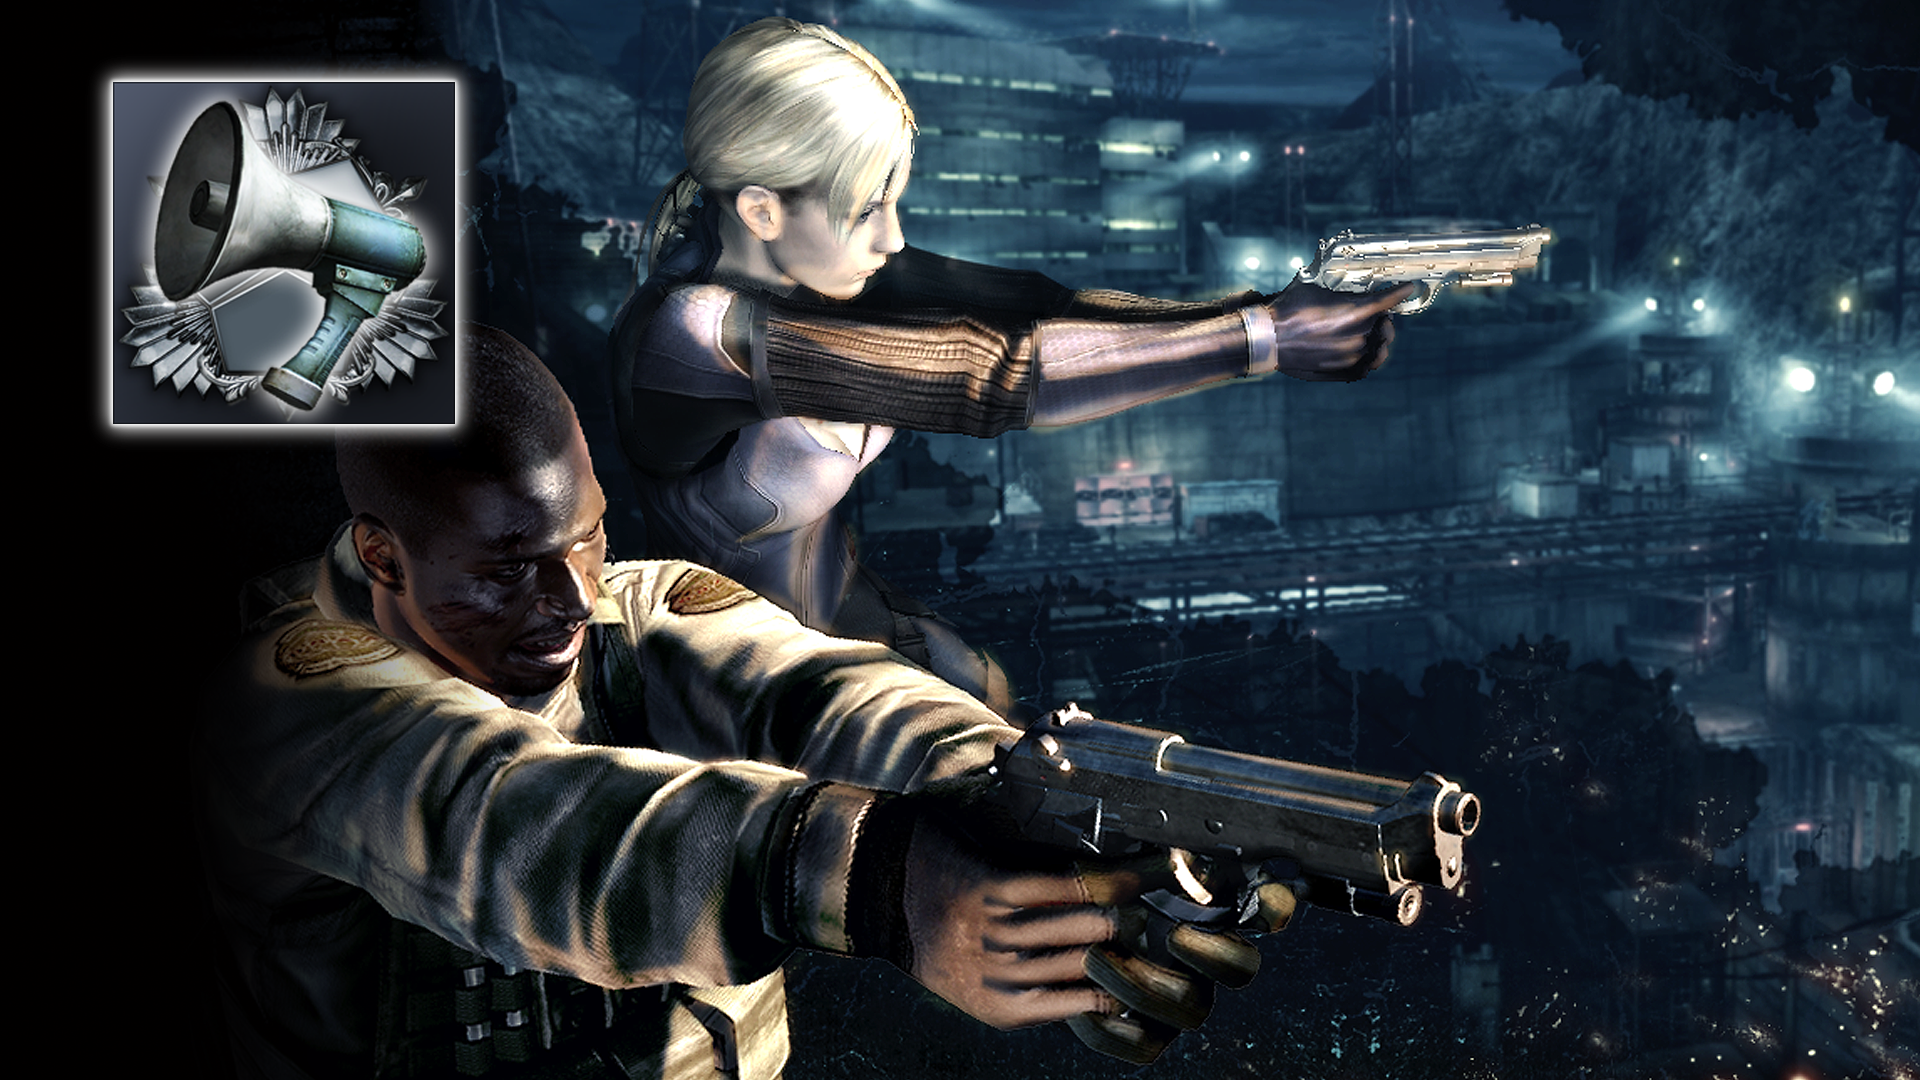 Xbox Resident Evil 5 Achievements Find Your Xbox Achievements On